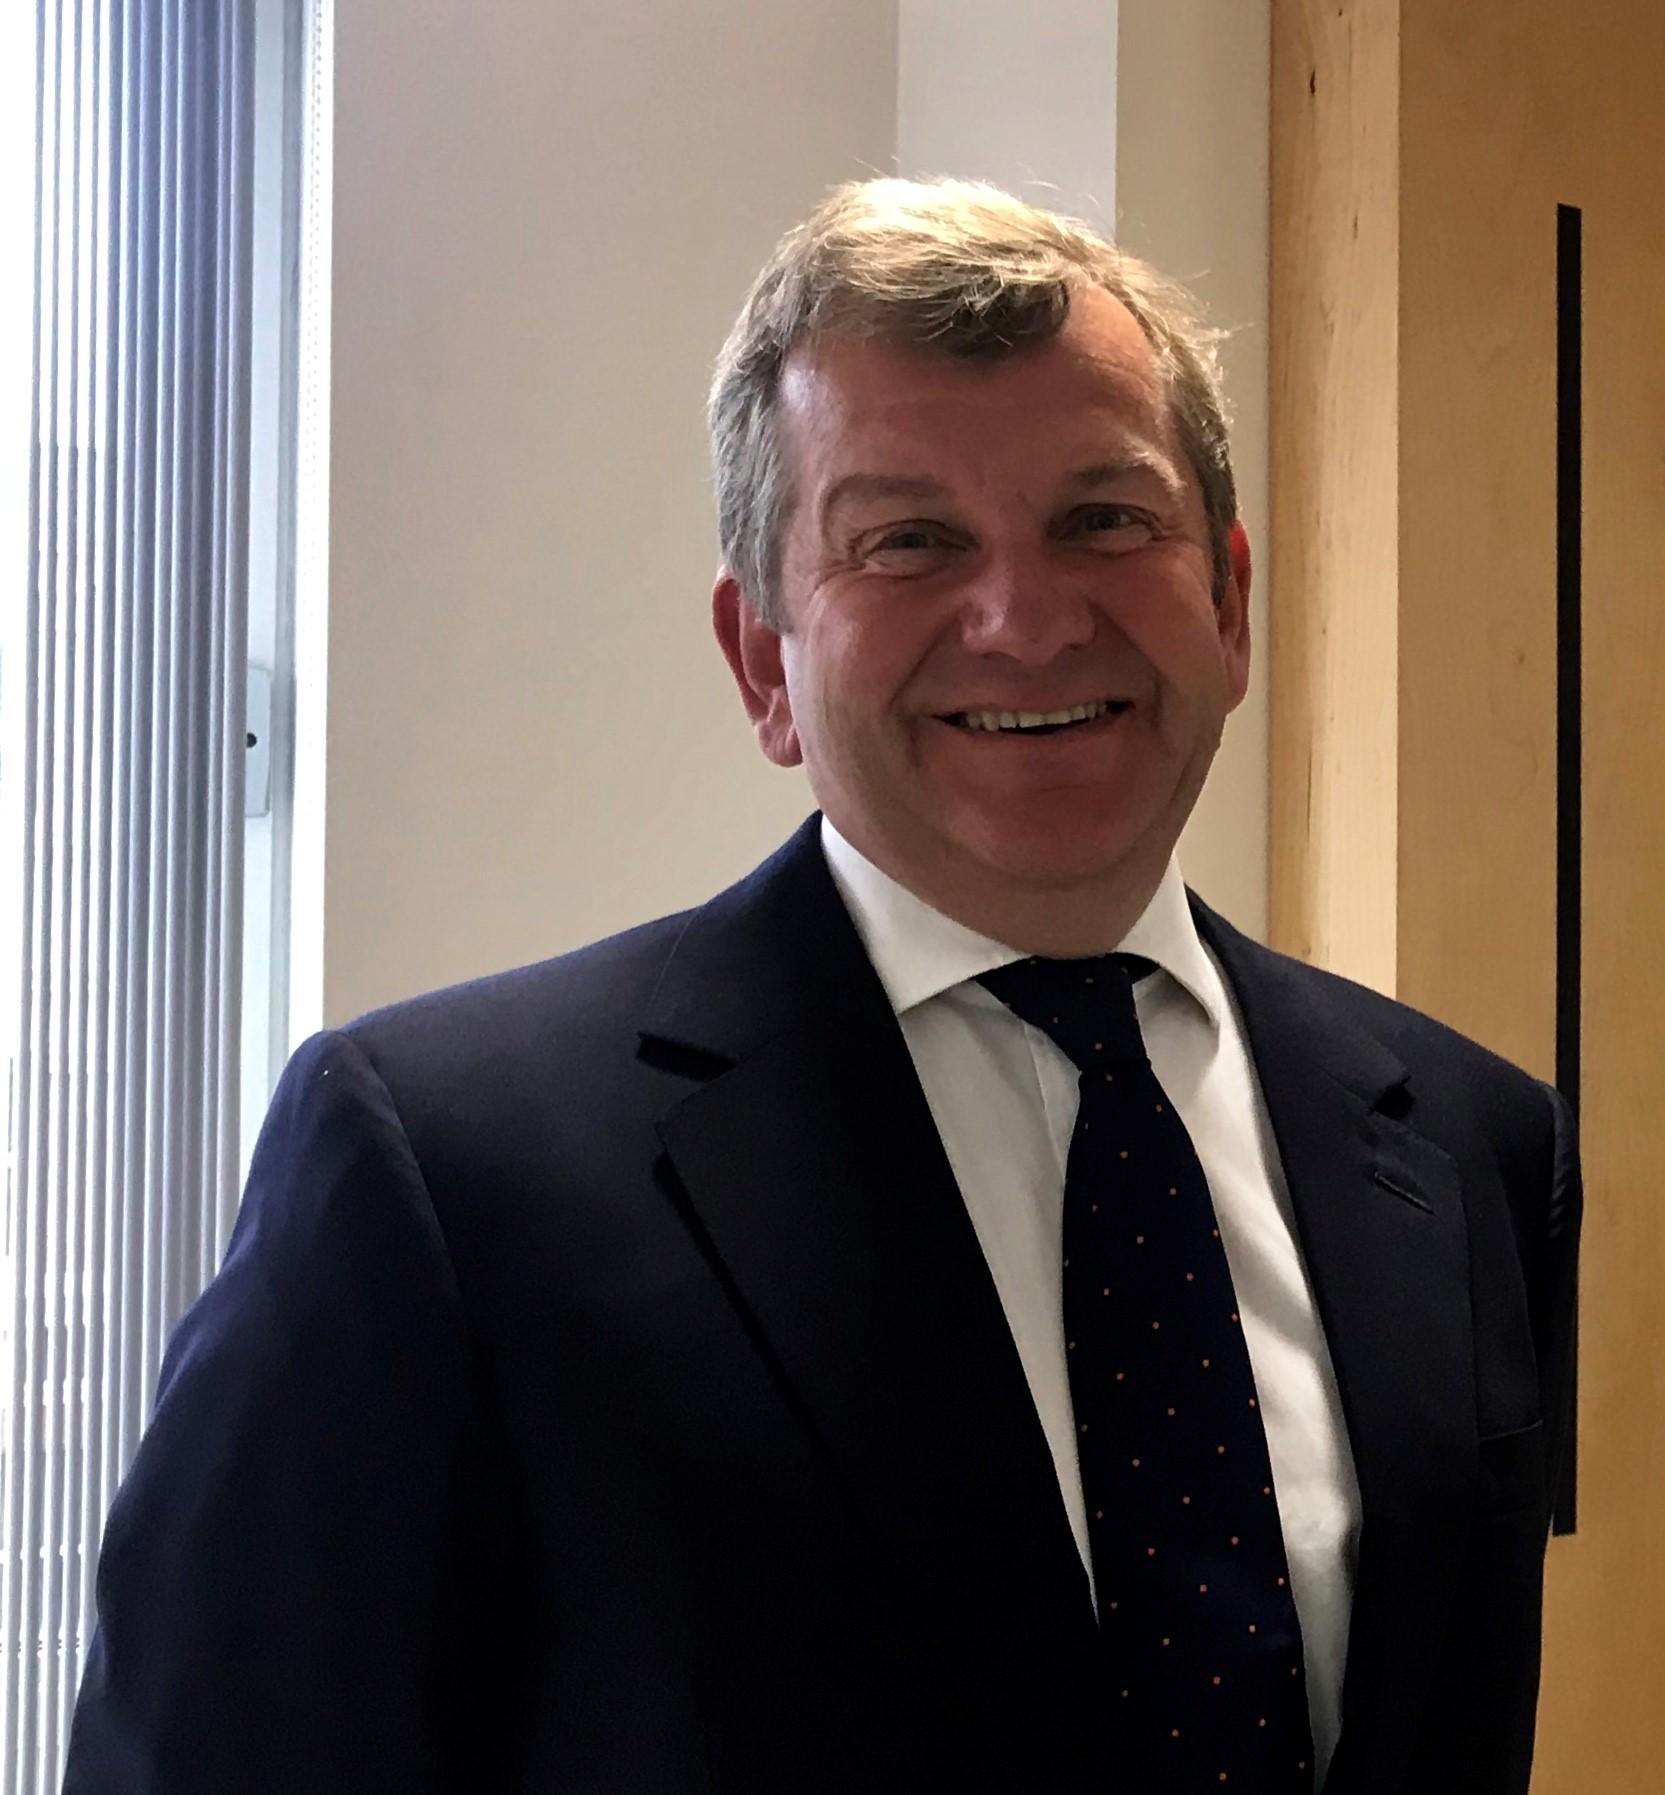 Simon Dudley in a suit